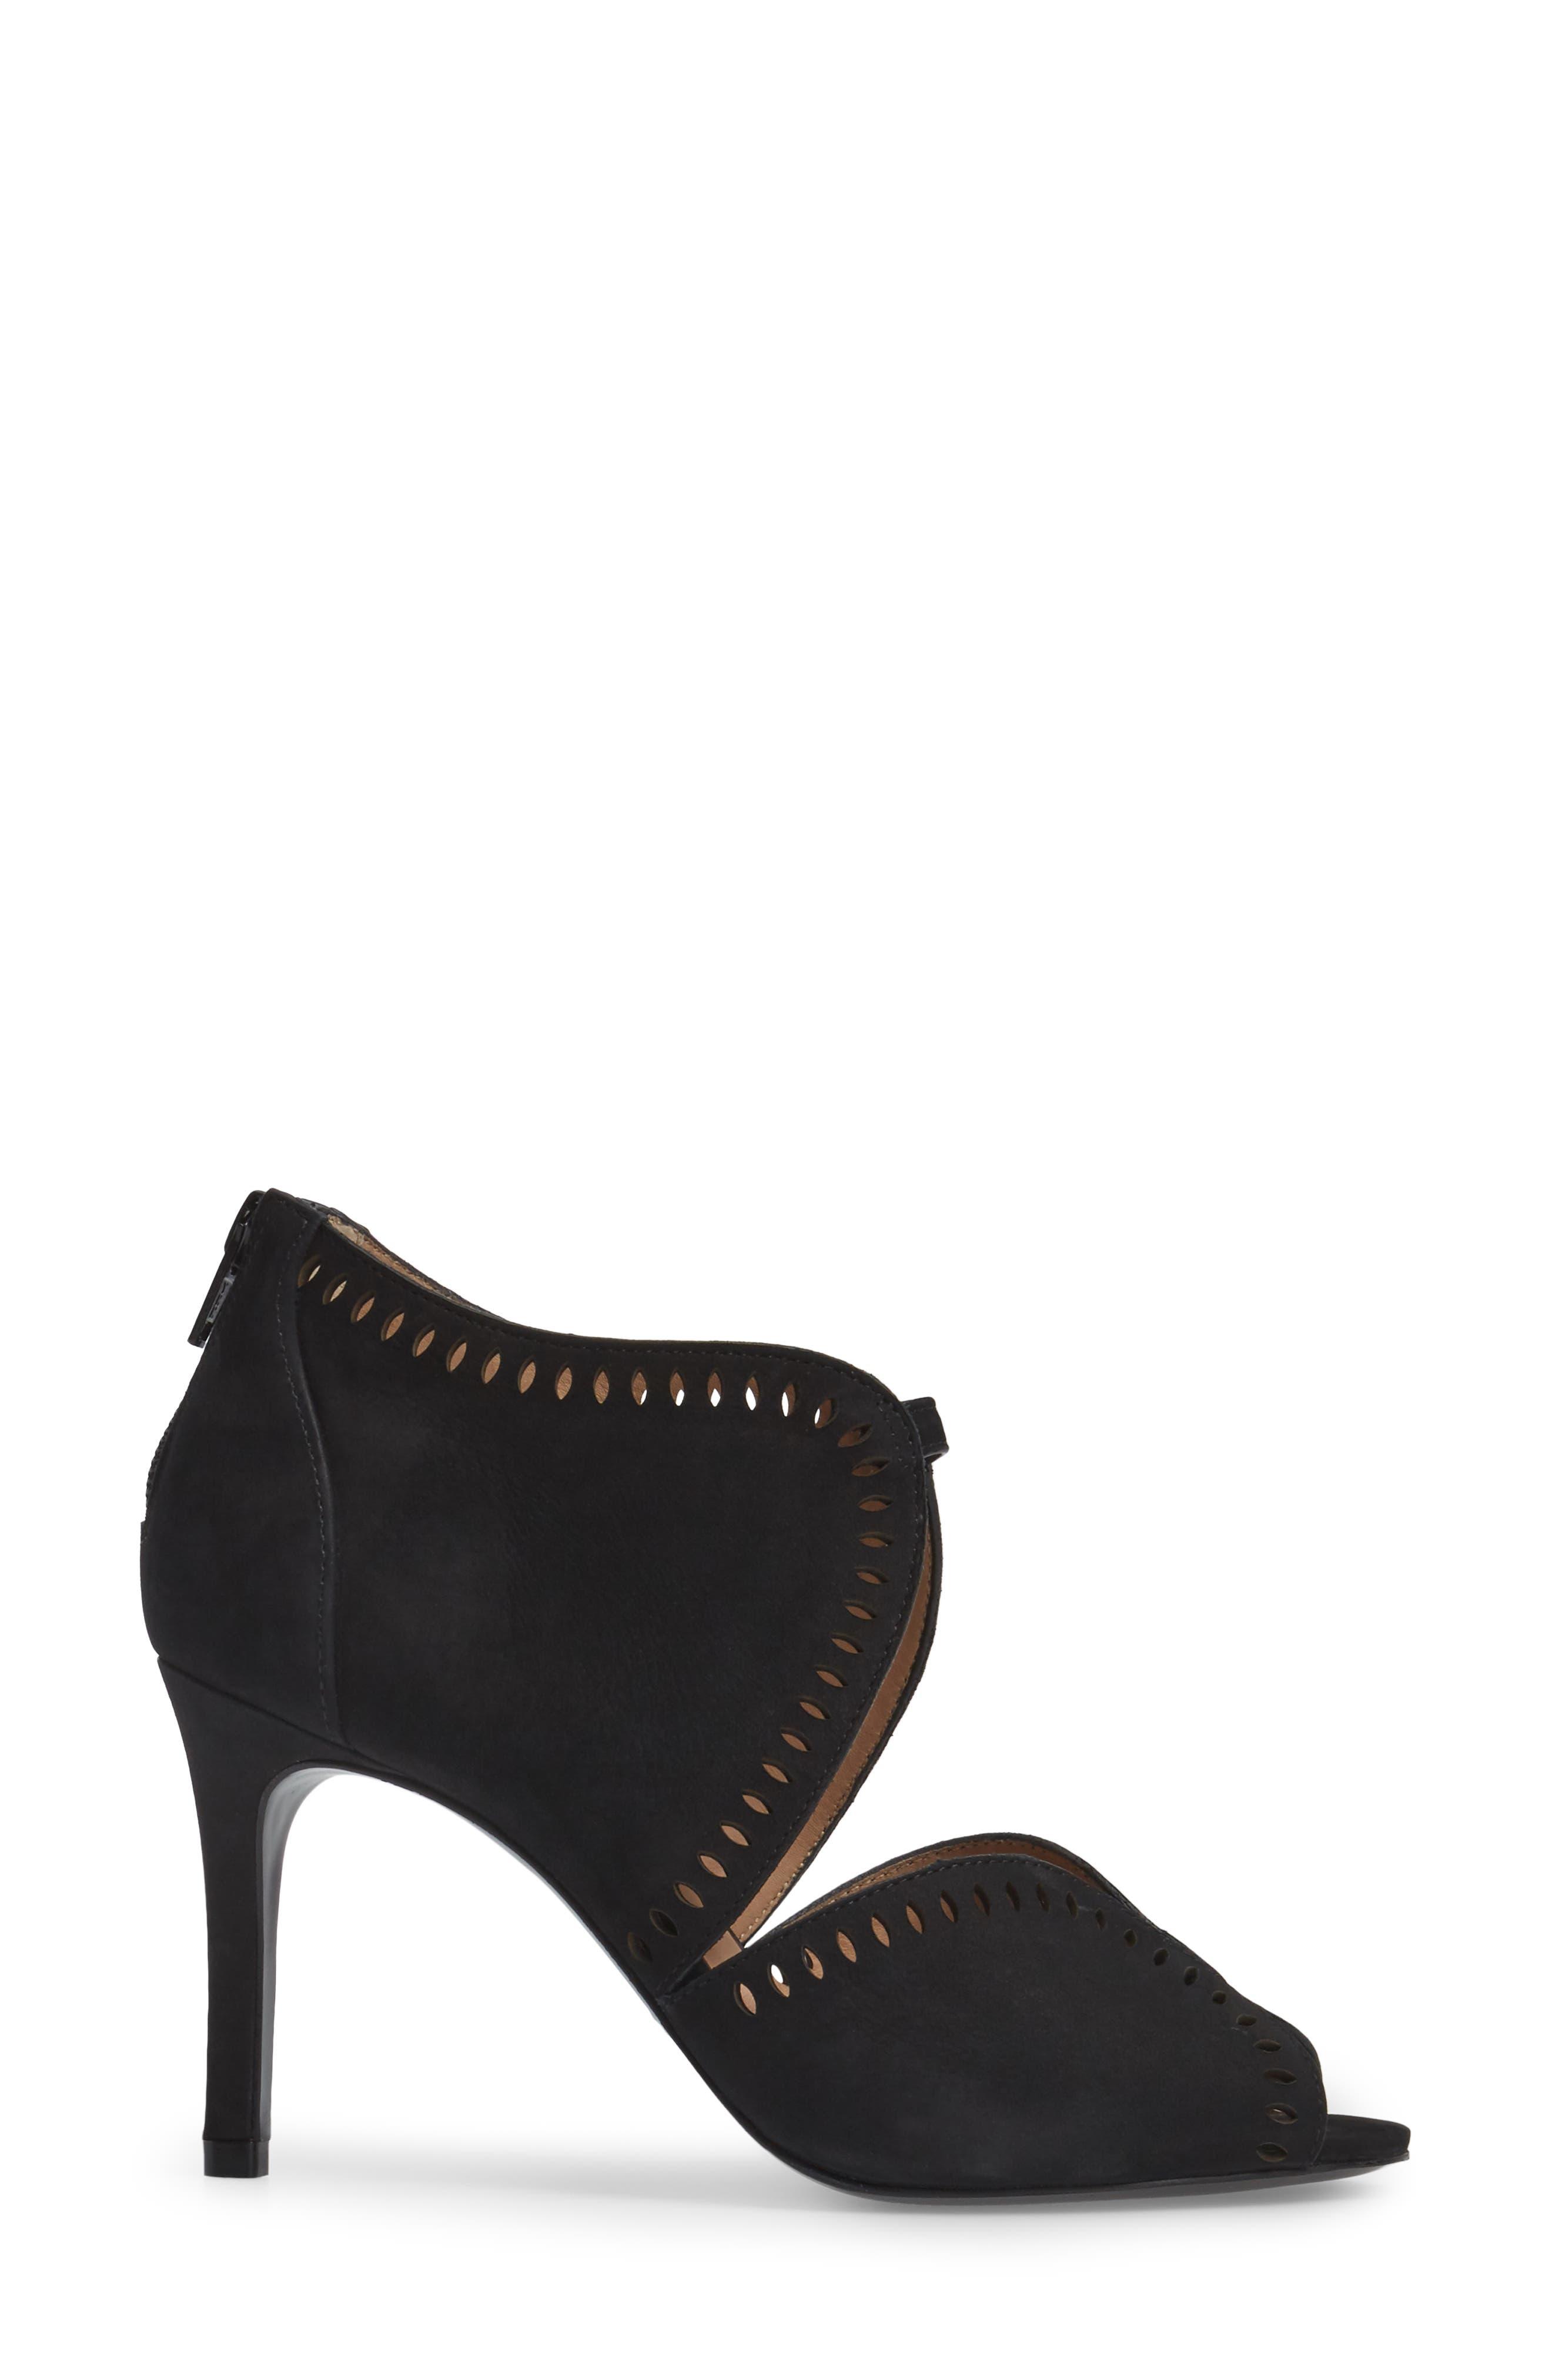 Mallia Perforated Sandal,                             Alternate thumbnail 3, color,                             001